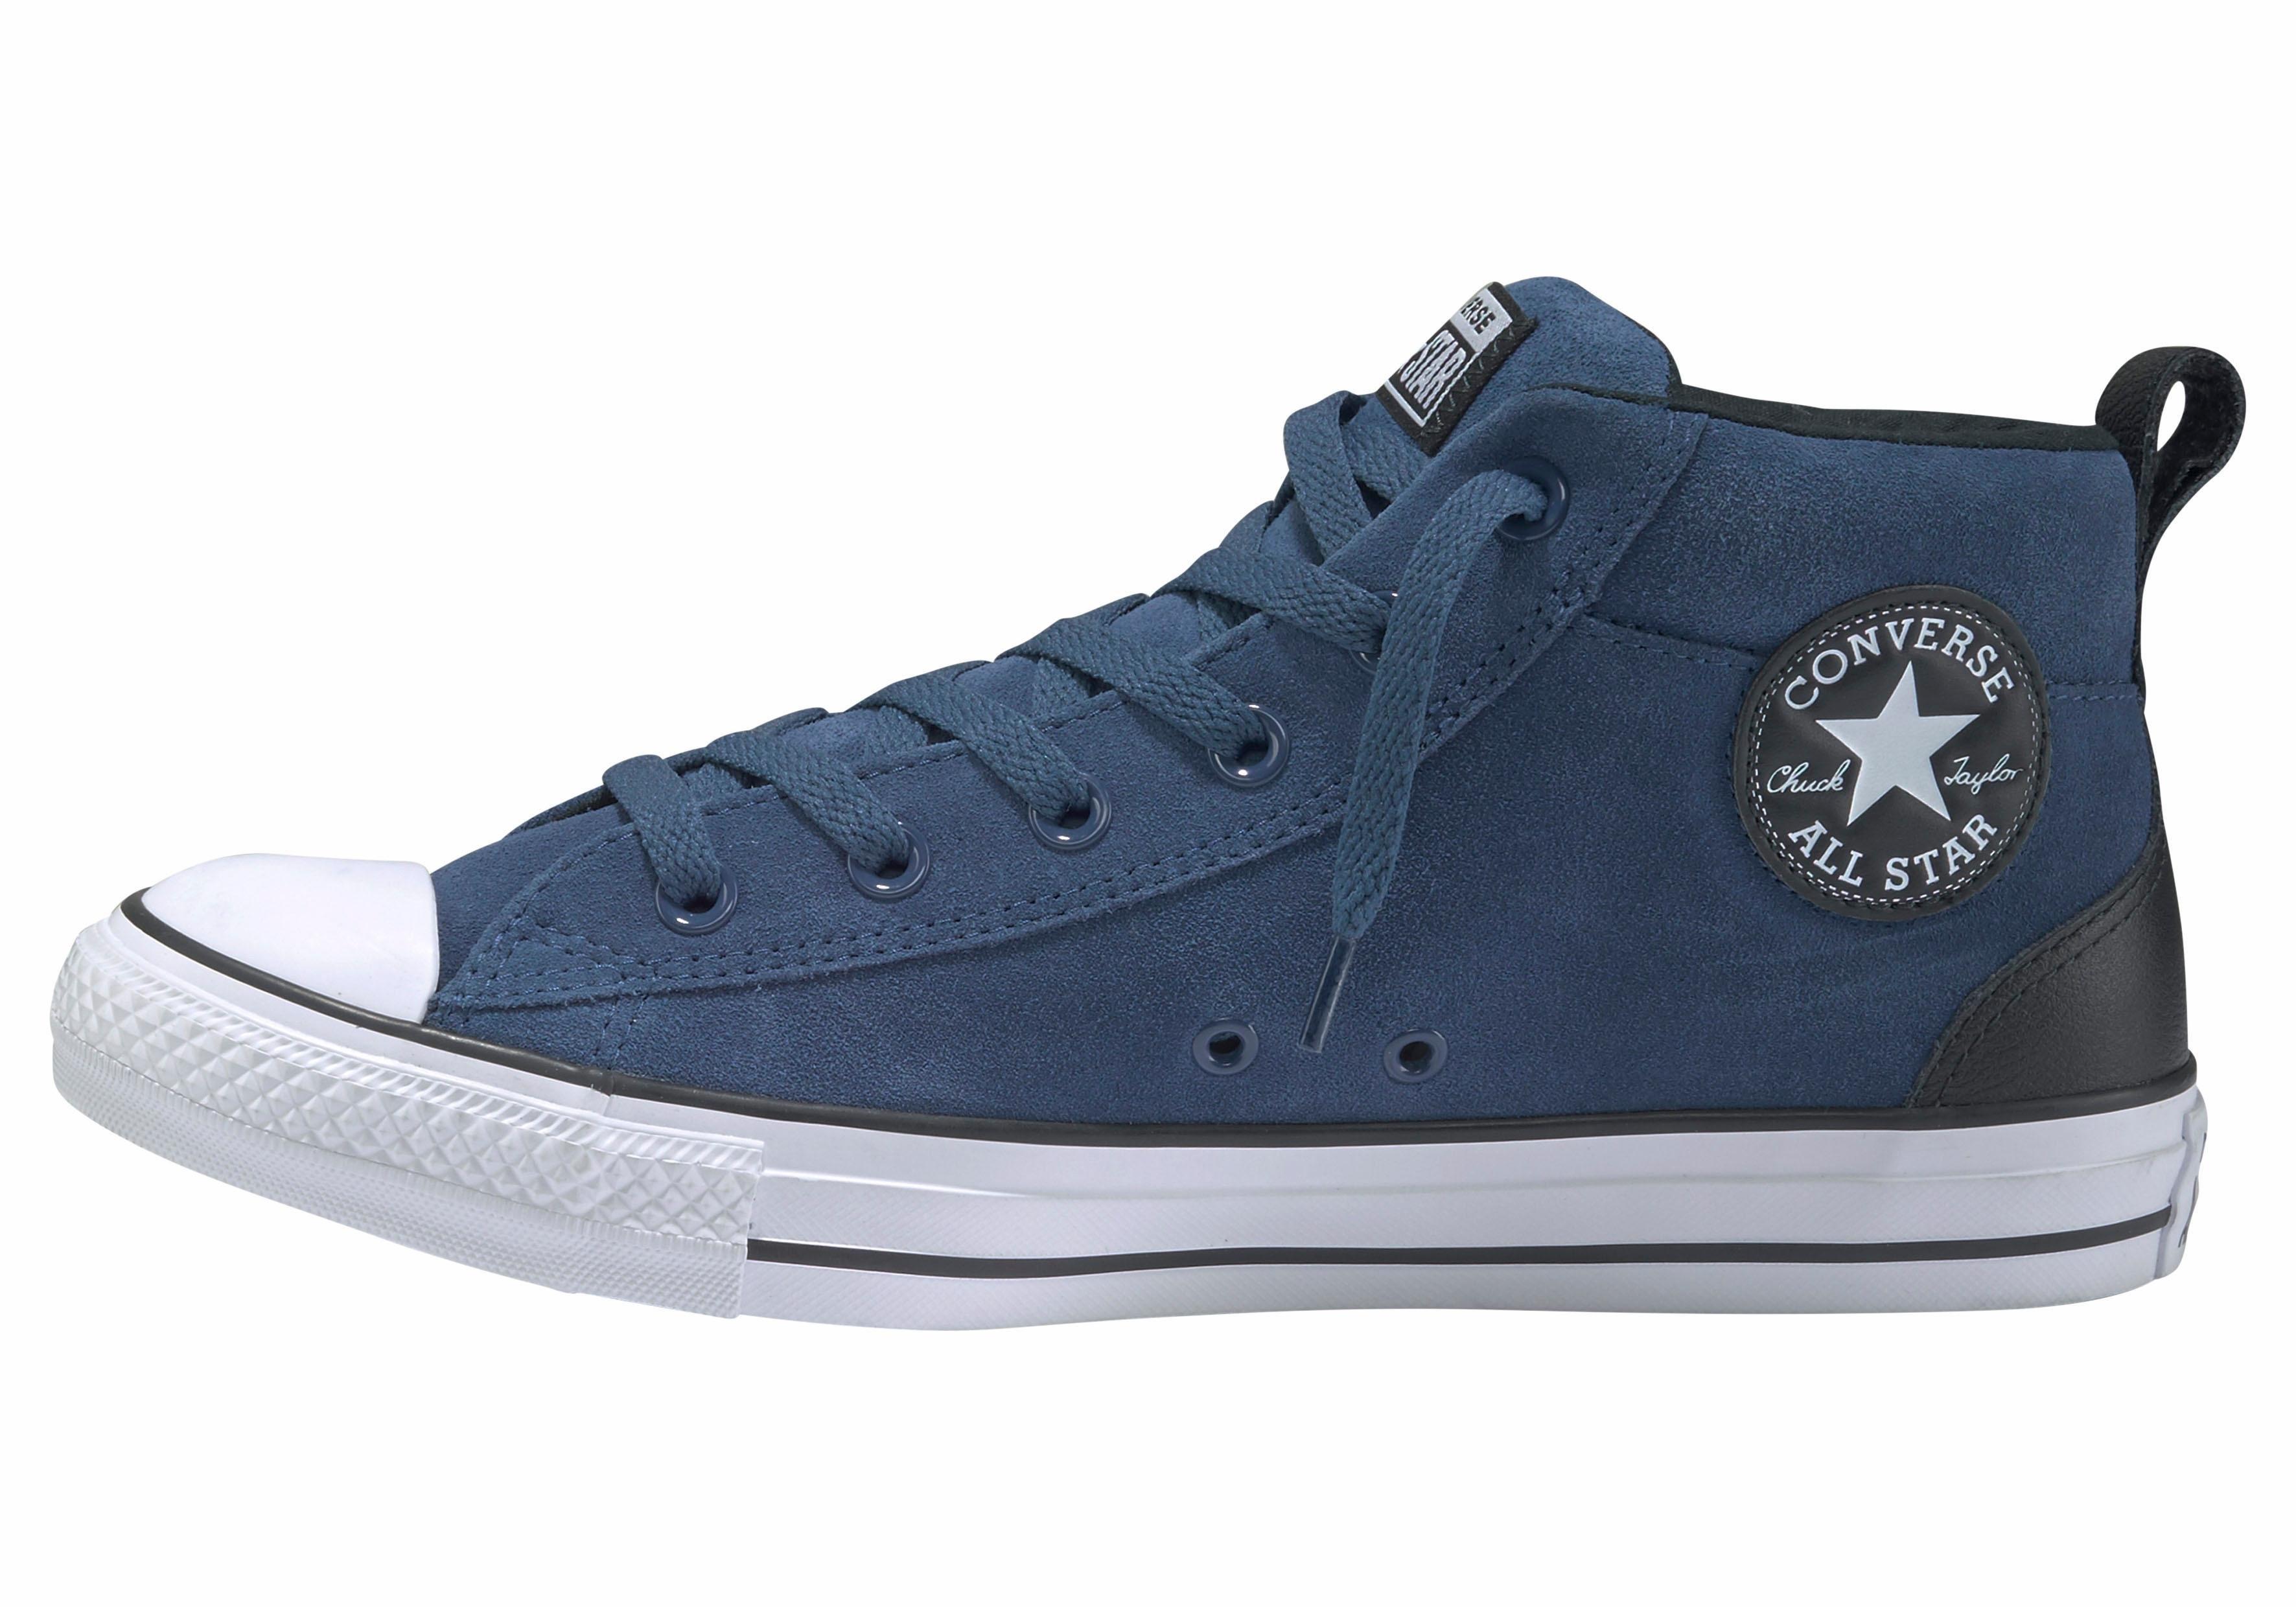 b1ffaa0140b Afbeeldingsbron: Converse sneakers »Chuck Taylor All Star Street Mid«